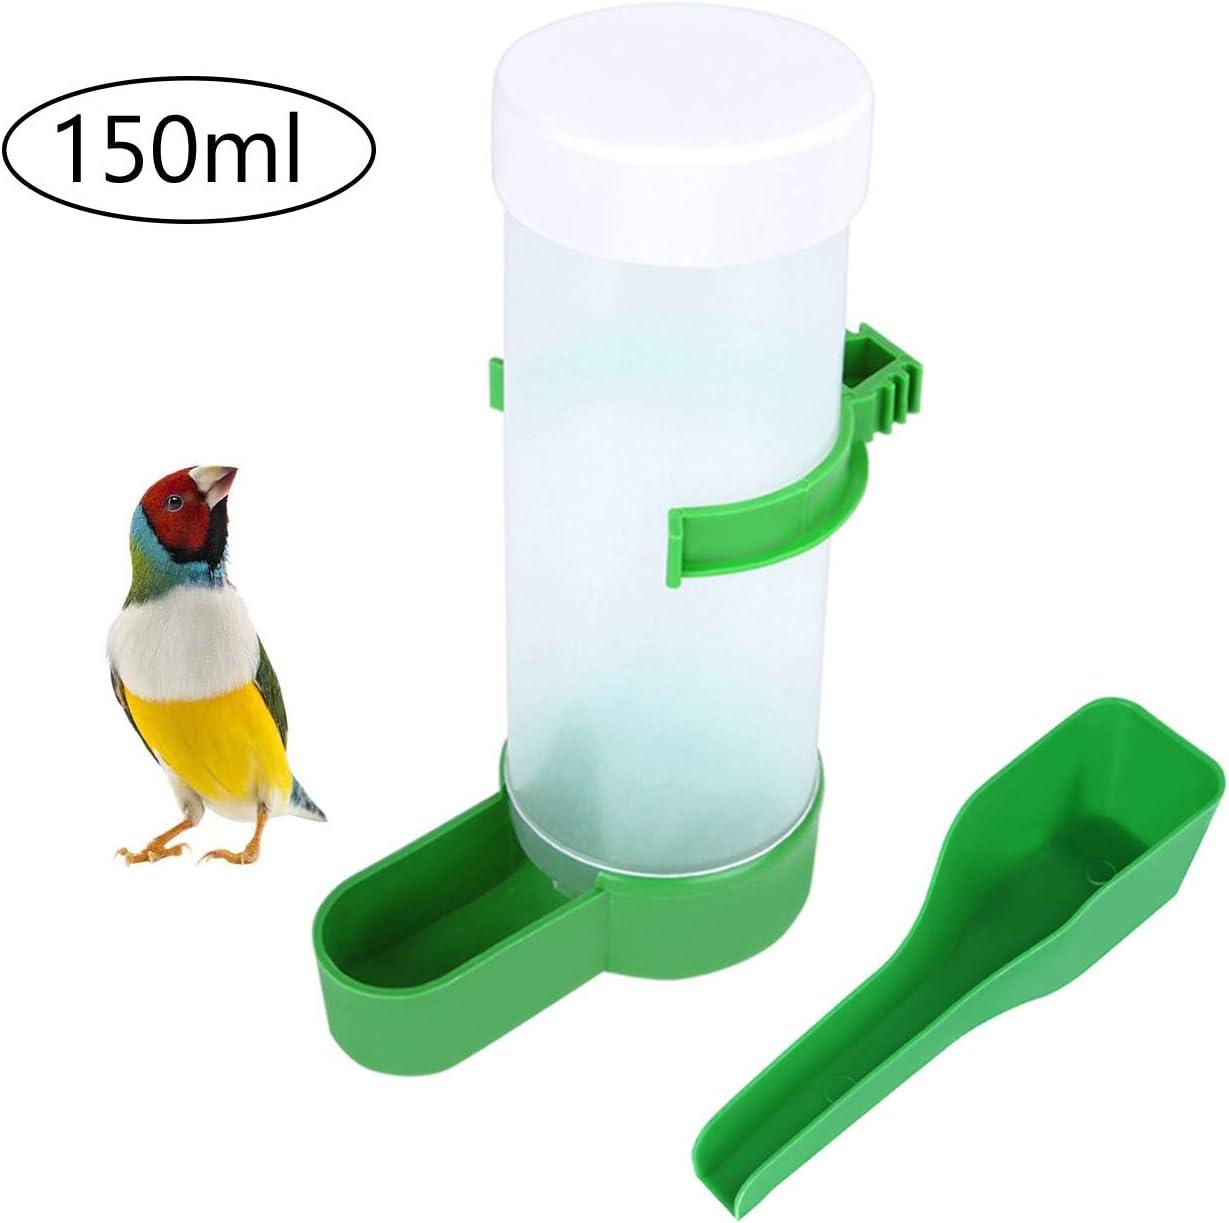 QX-Pet Supplies Automatic Bird Feeder Bird Water Bottle Drinker Container Food Dispenser Hanging in Birds Cage for Parrots Budgie Cockatiel Lovebirds